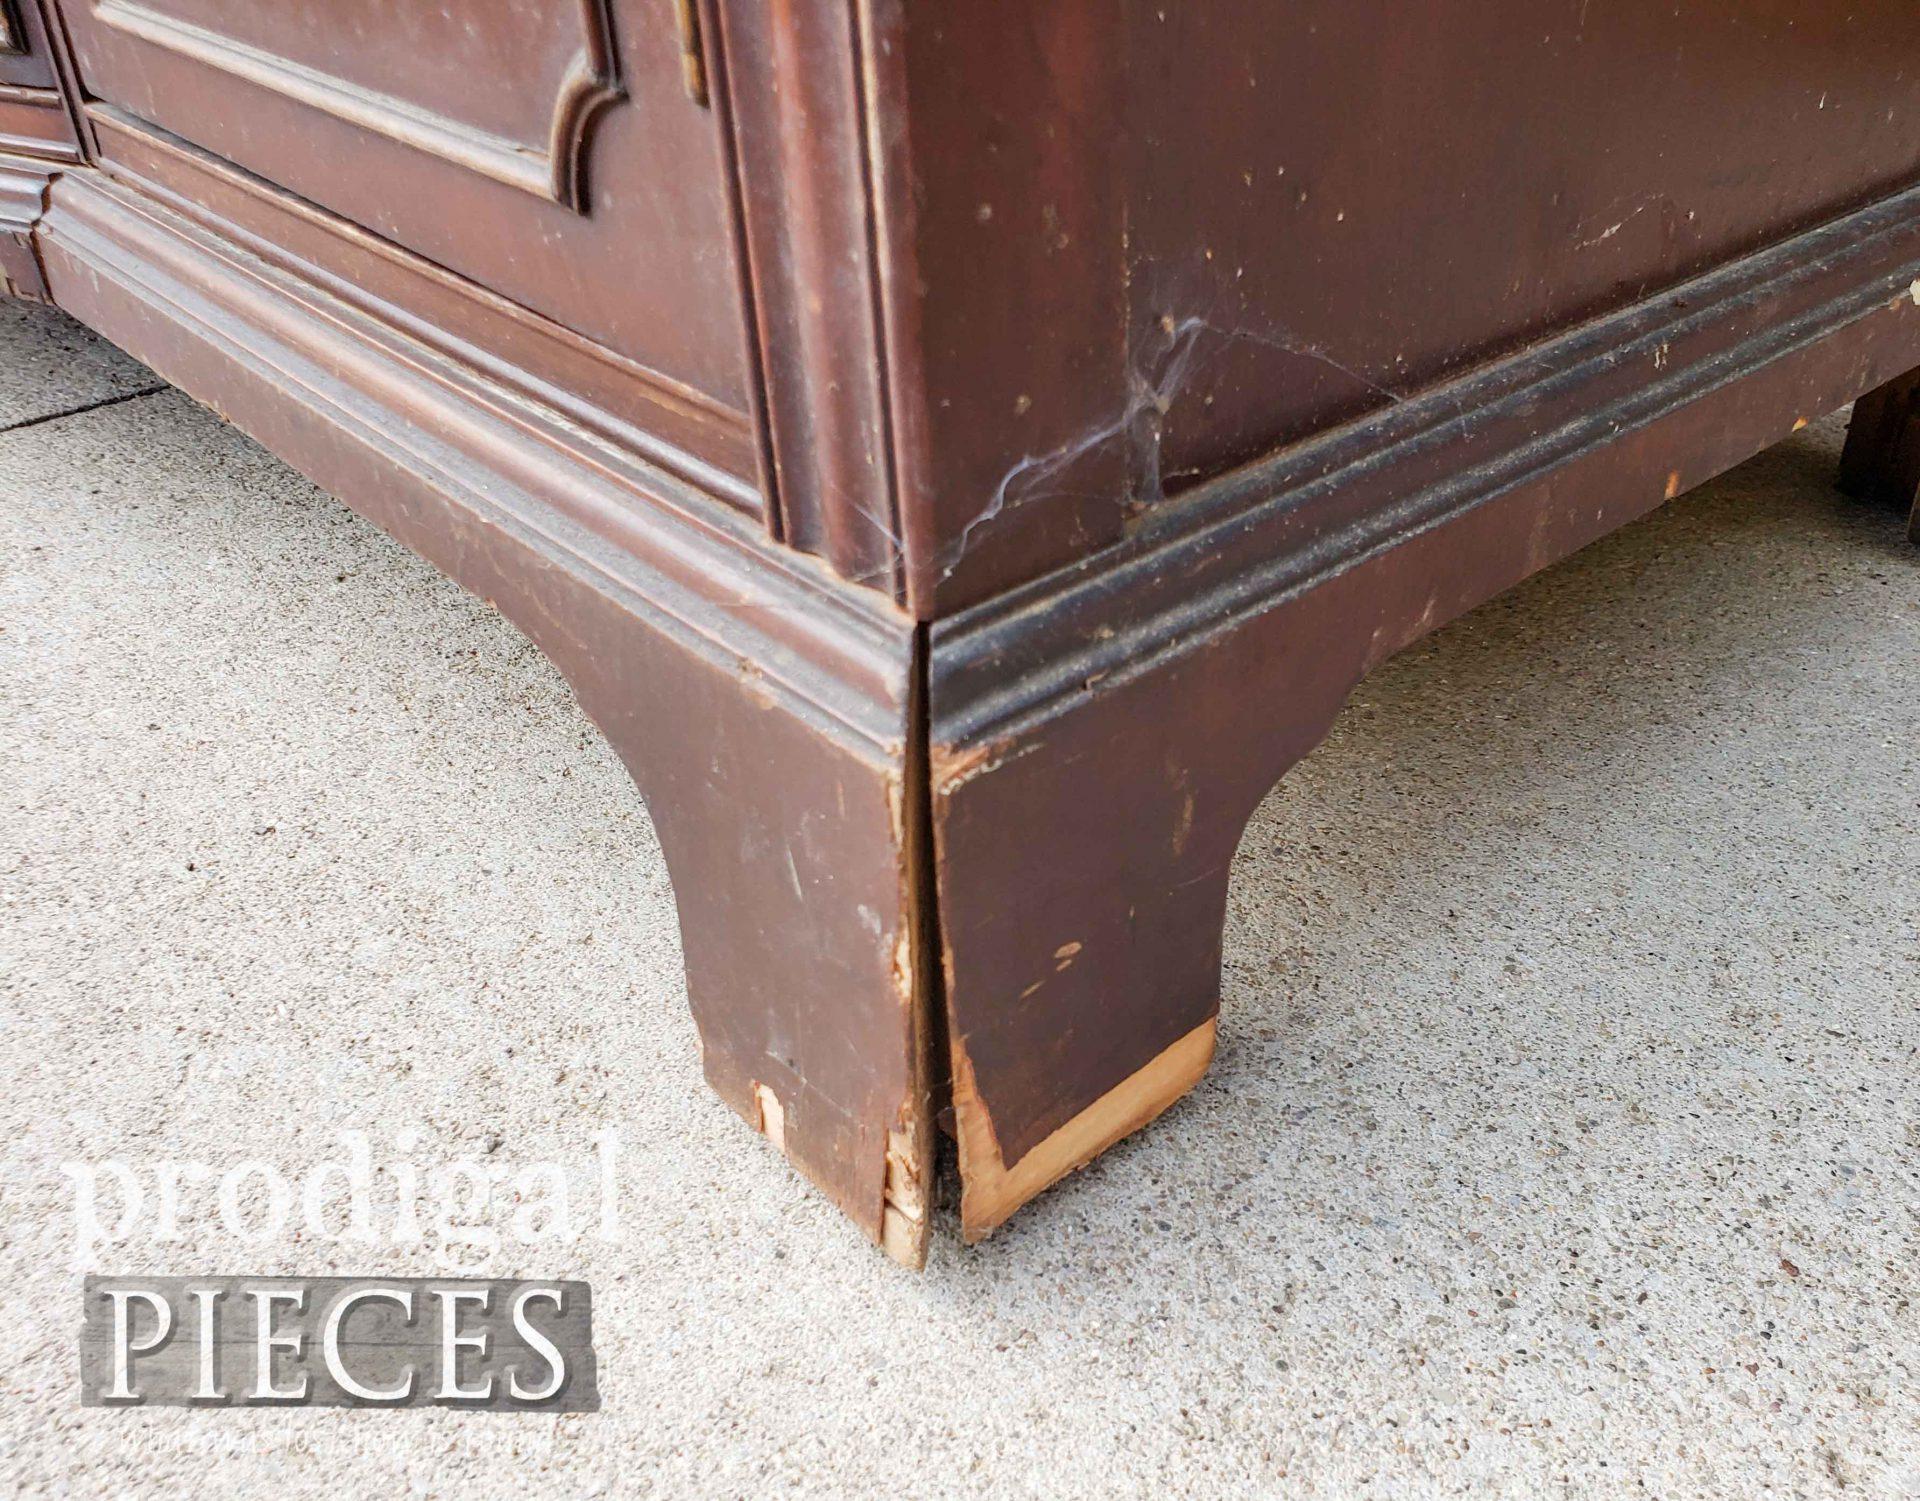 Damaged Buffet Foot and Skirt | prodigalpieces.com